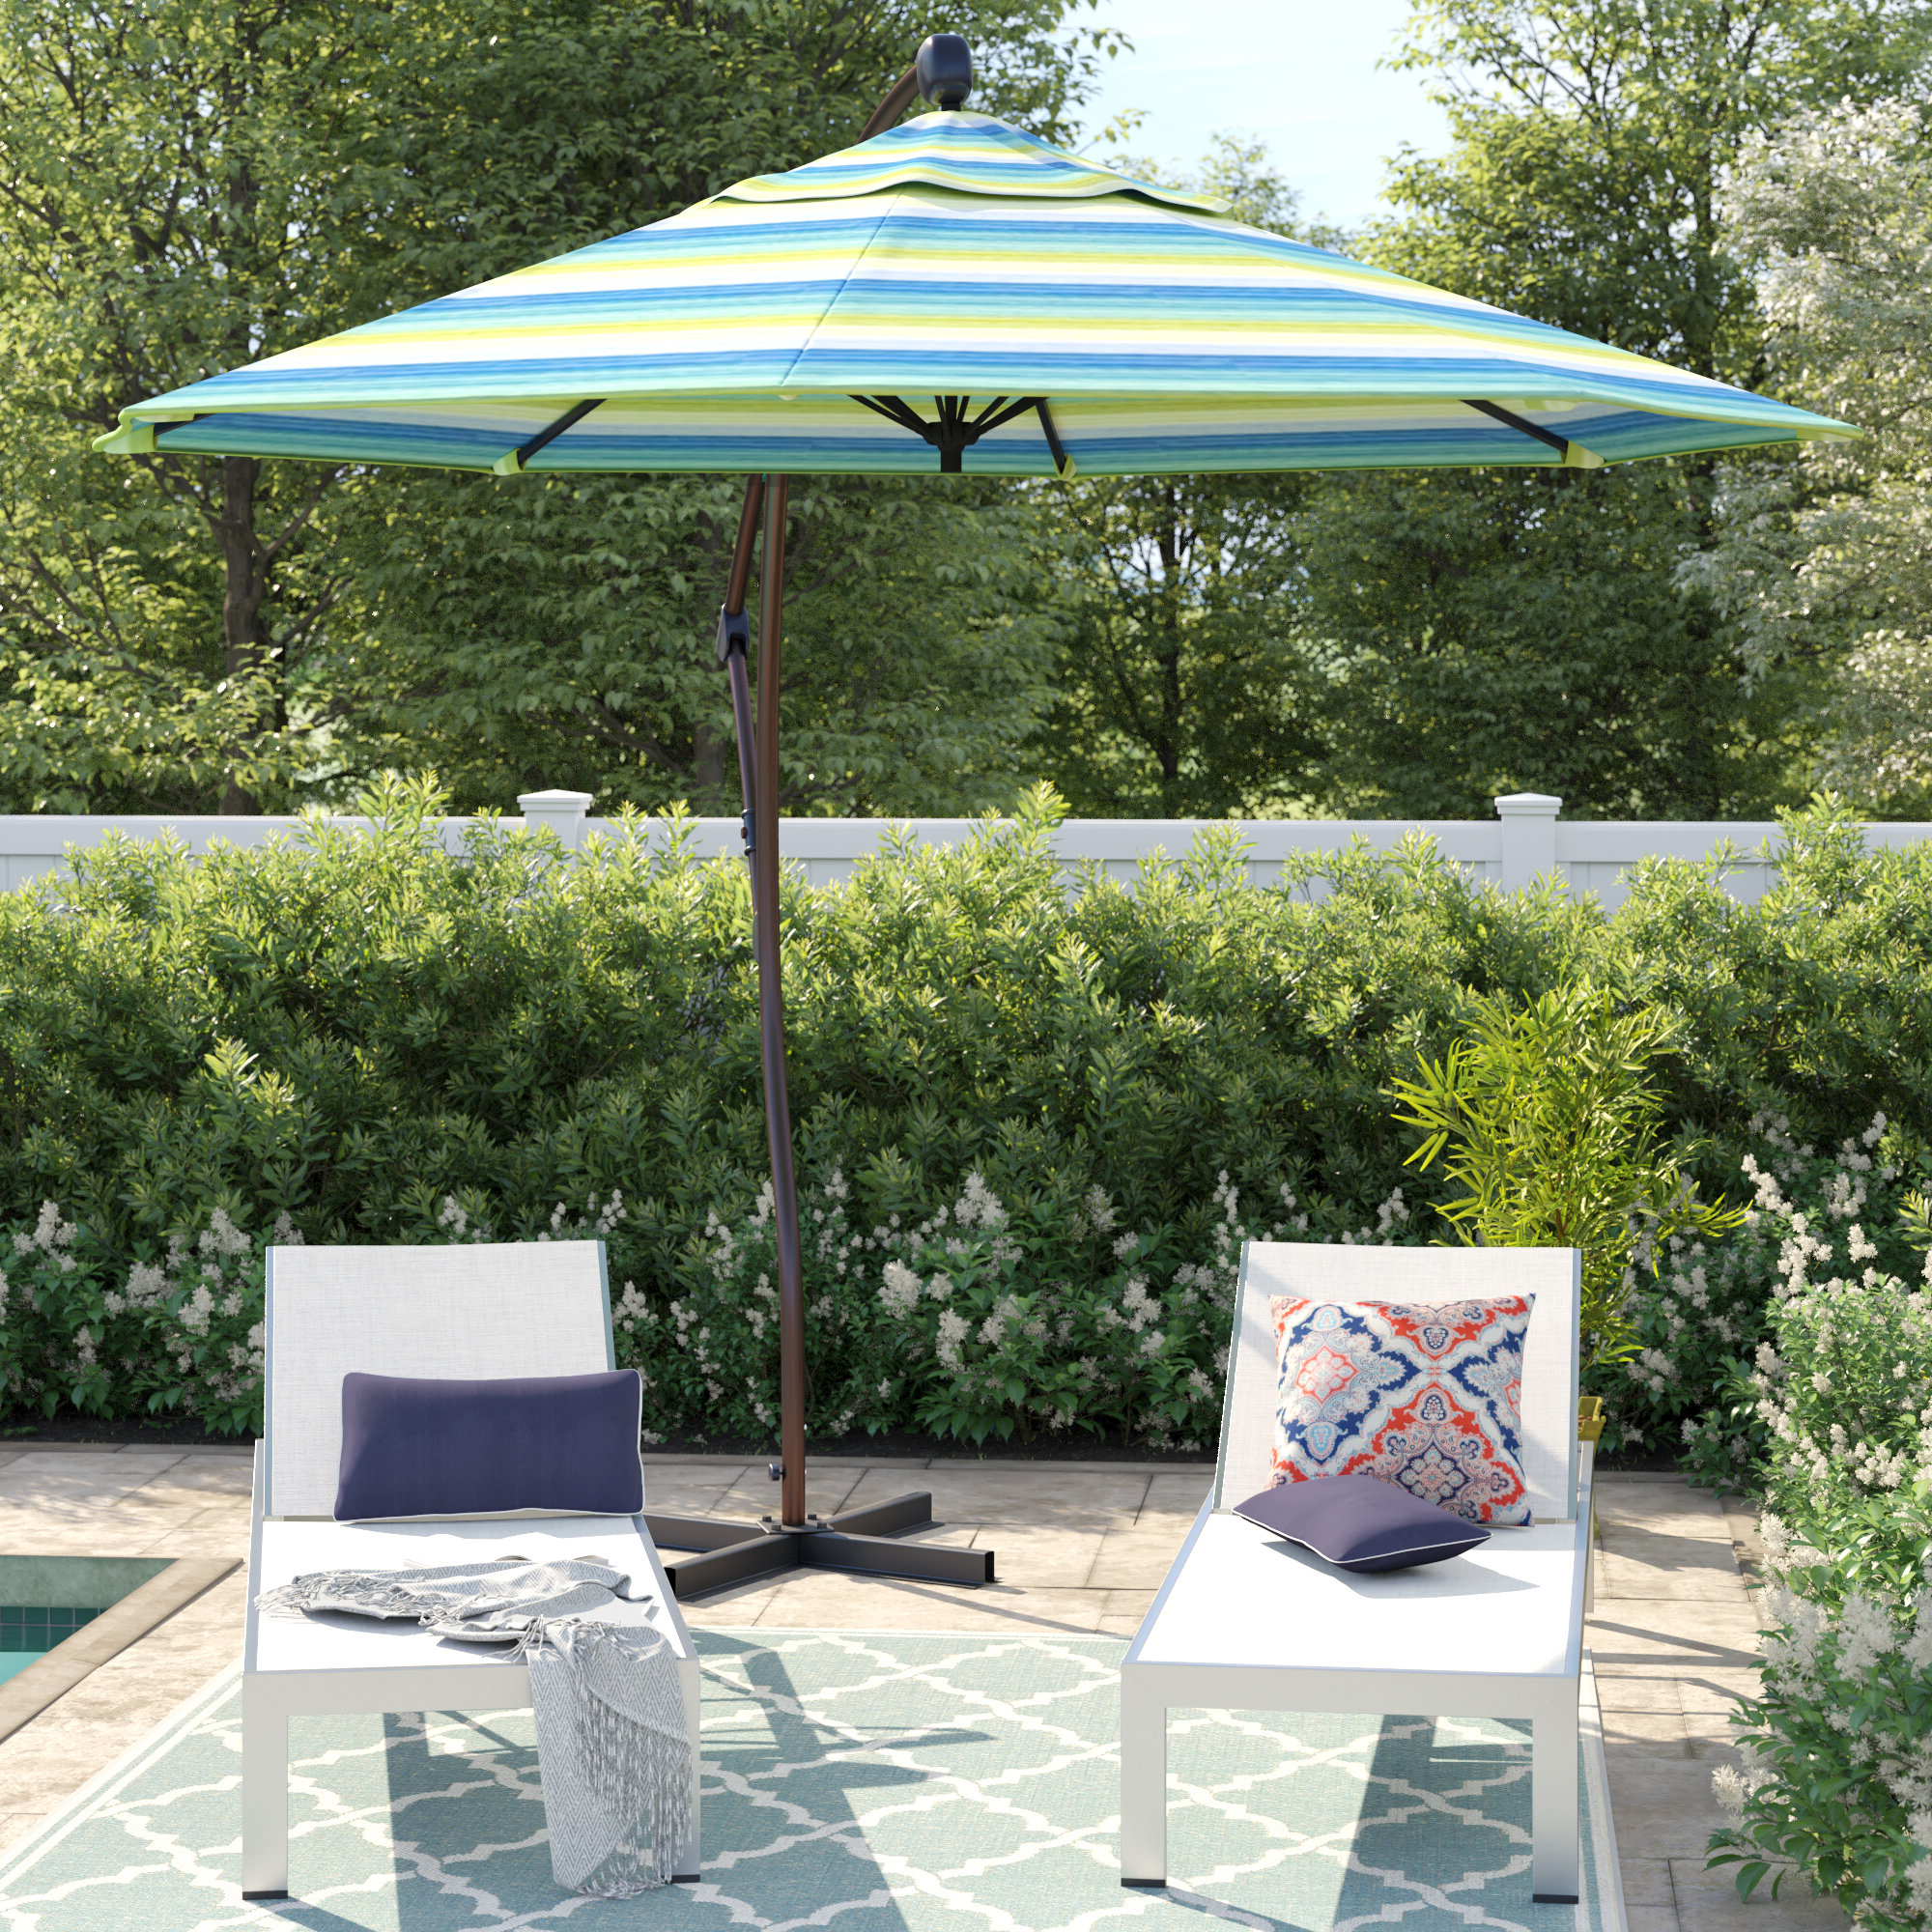 Emely Cantilever Sunbrella Umbrellas For Most Up To Date Capri 9' Cantilever Sunbrella Umbrella (Gallery 6 of 20)